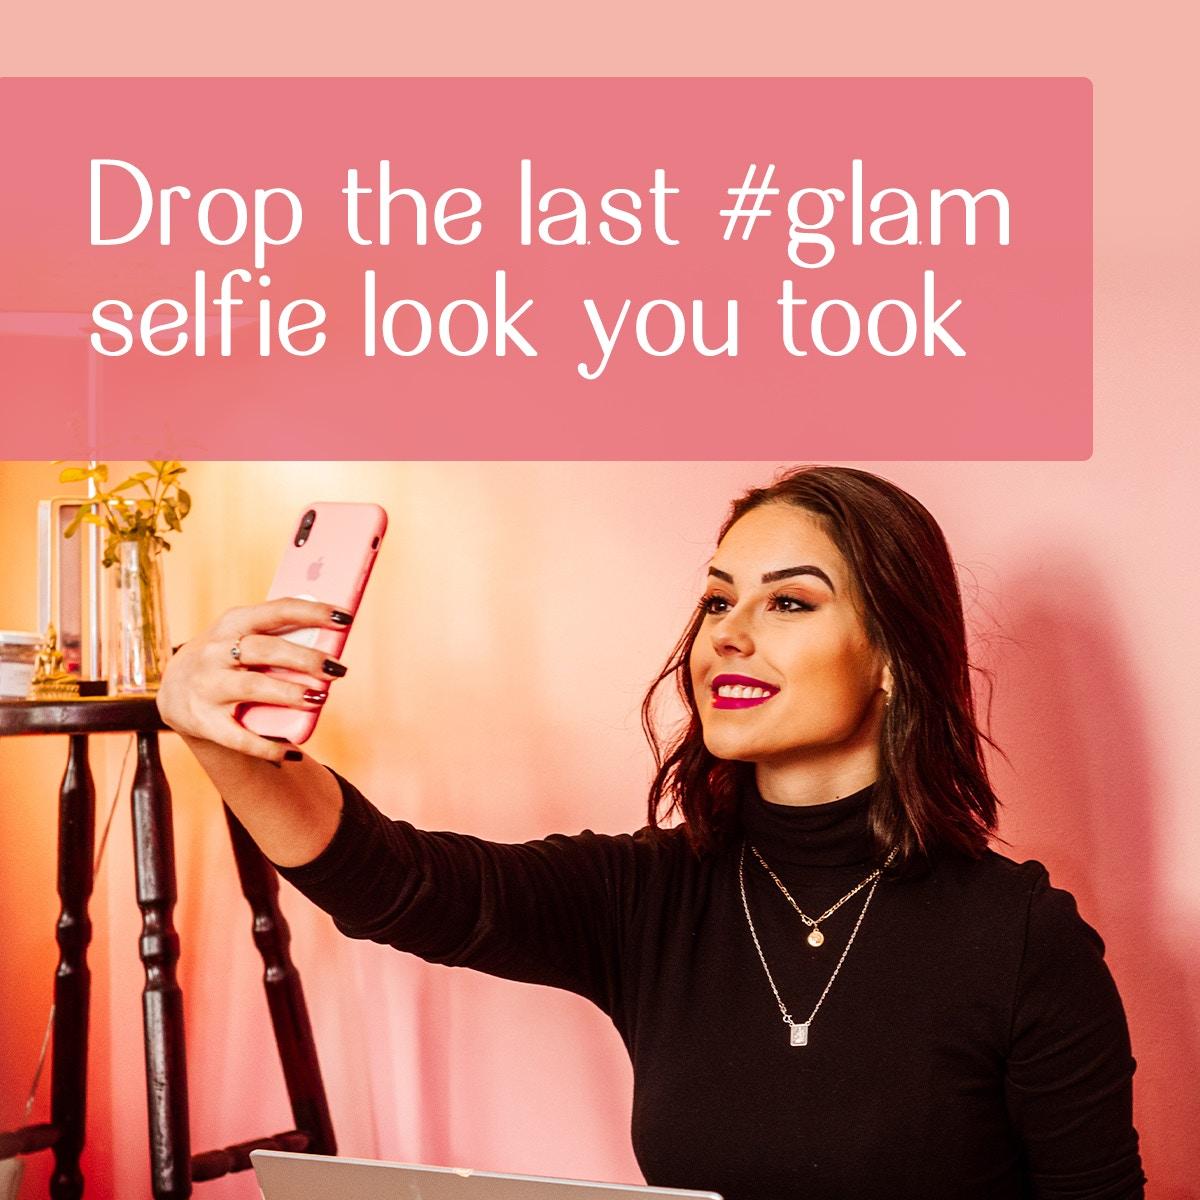 #avon #holisticbeauty #entrepreneur #shopping #onlineshopping #savings #fragrance #bathandbody #skincare #fashion #haircare #skincare #selfie #beauty https://t.co/jmavSF8evj https://t.co/7MLNNFzAXp